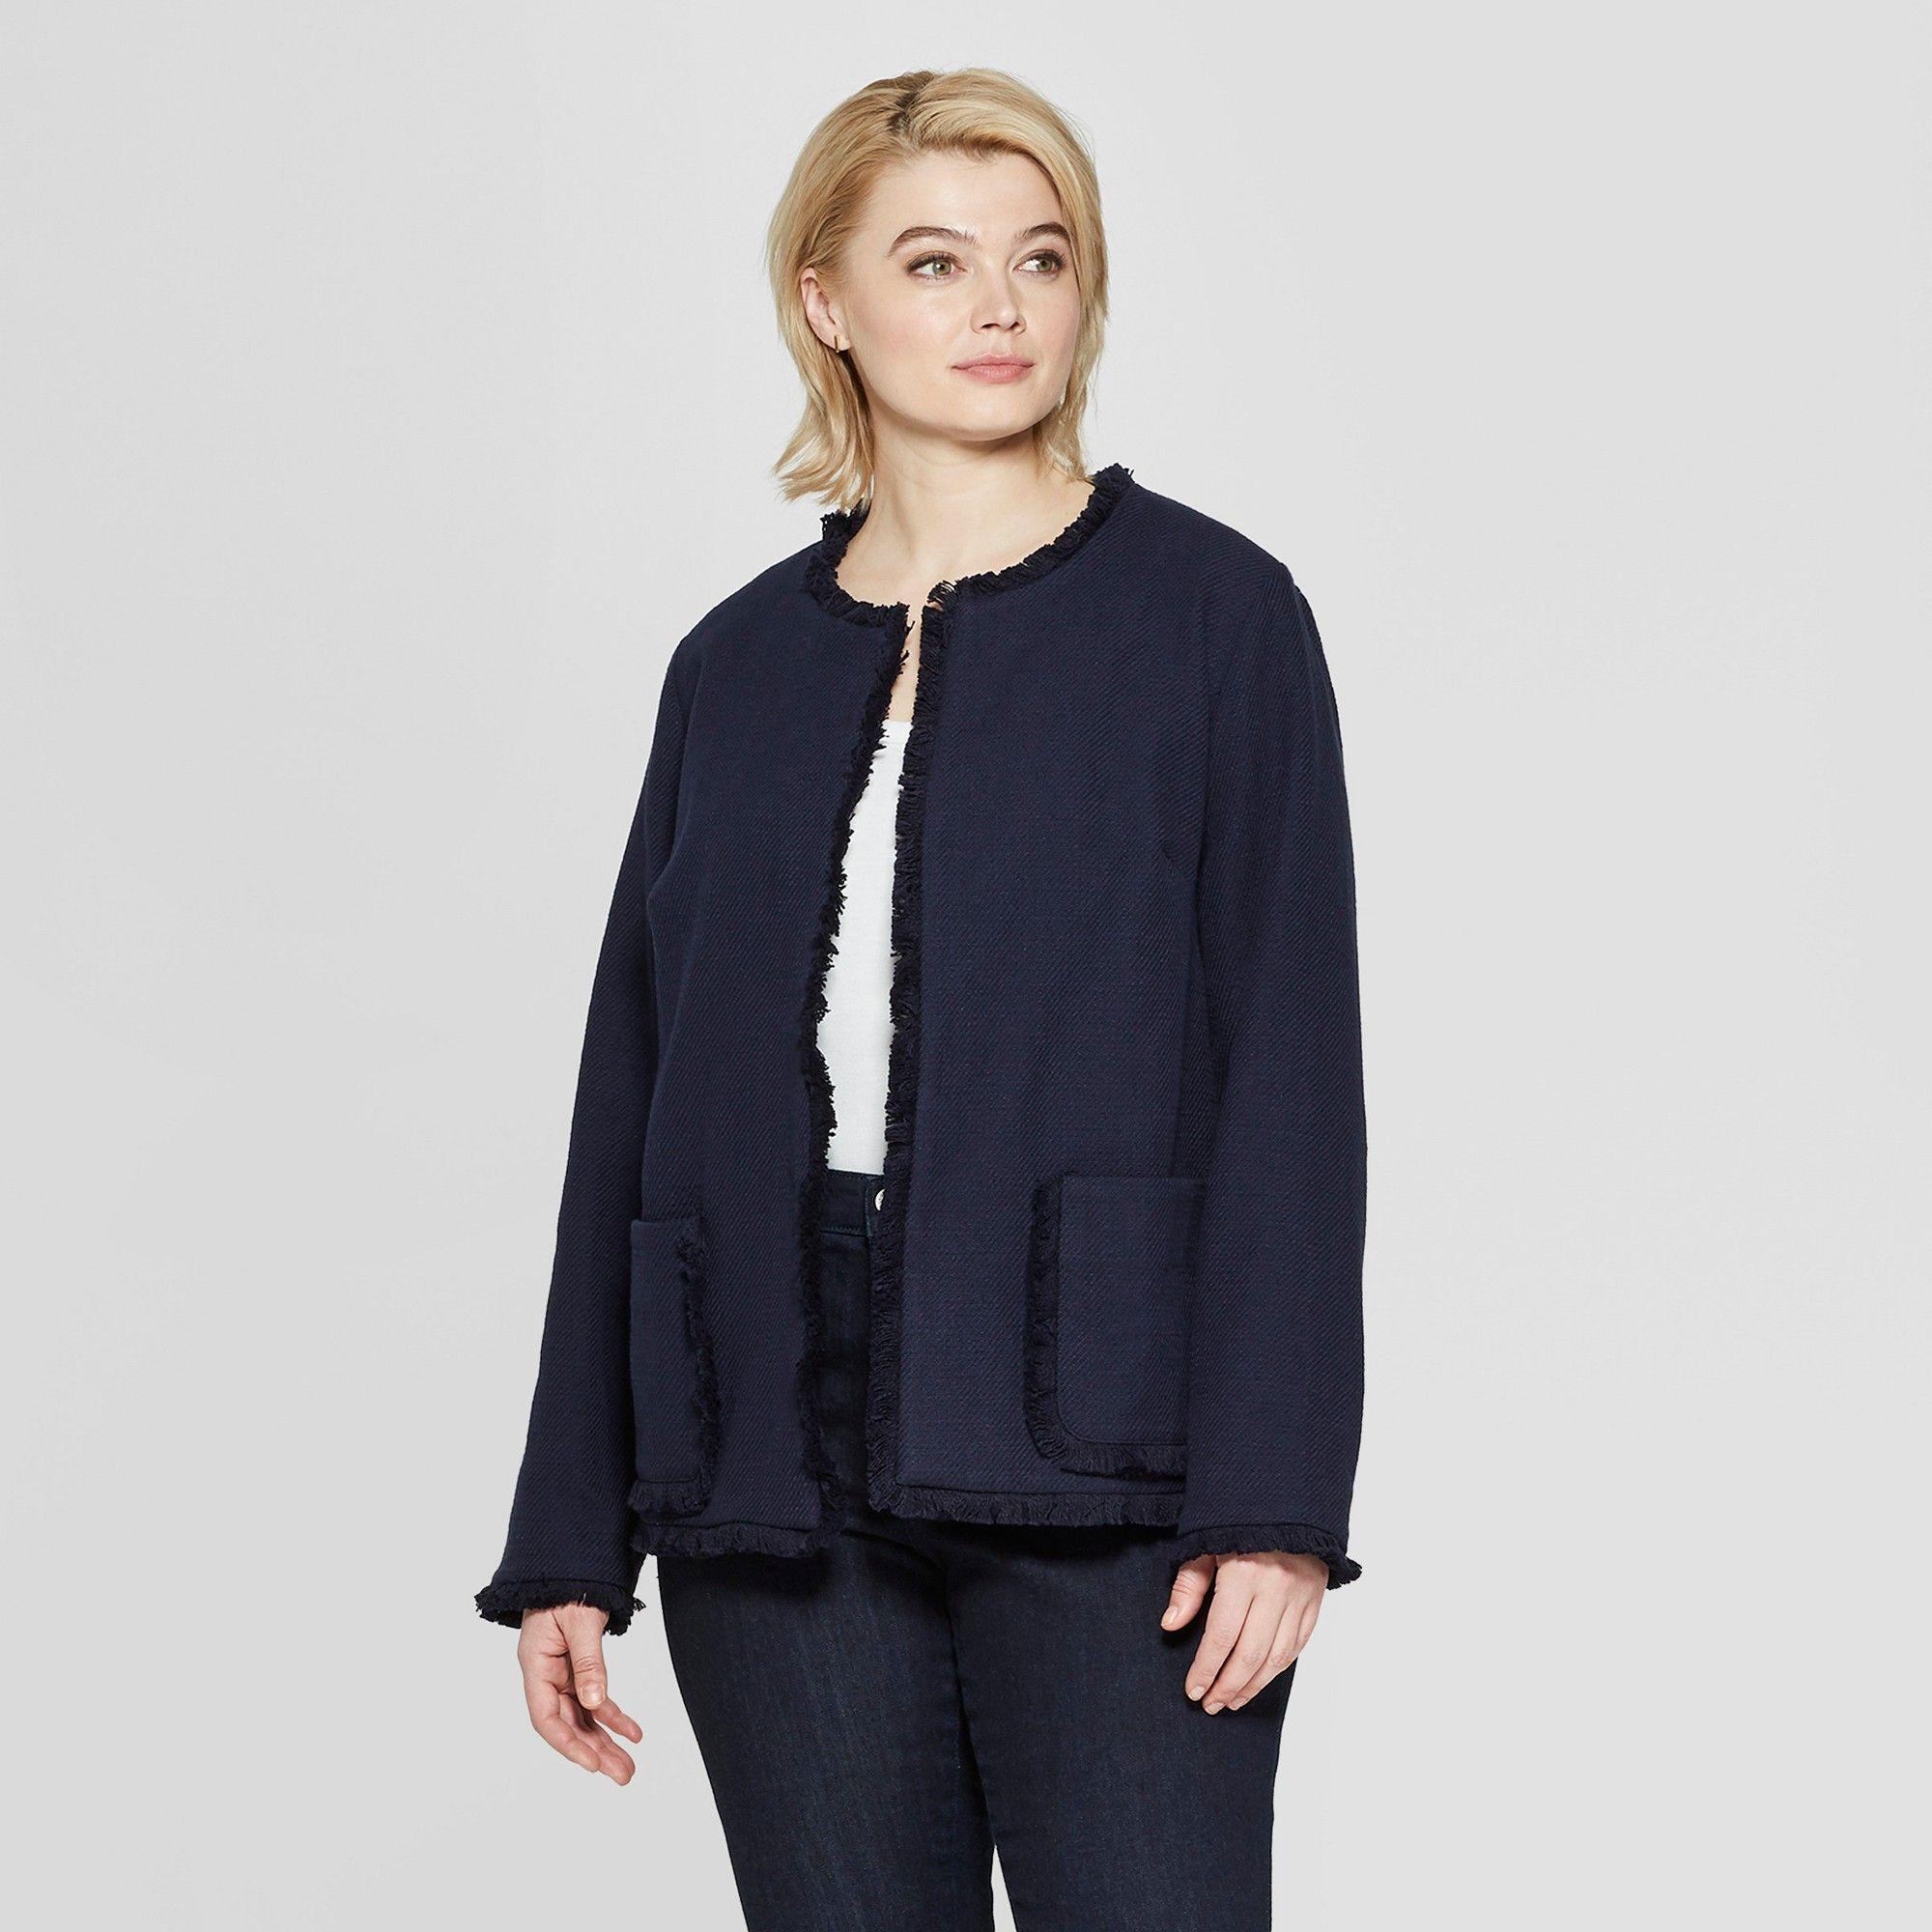 plus size women's tweed jacket